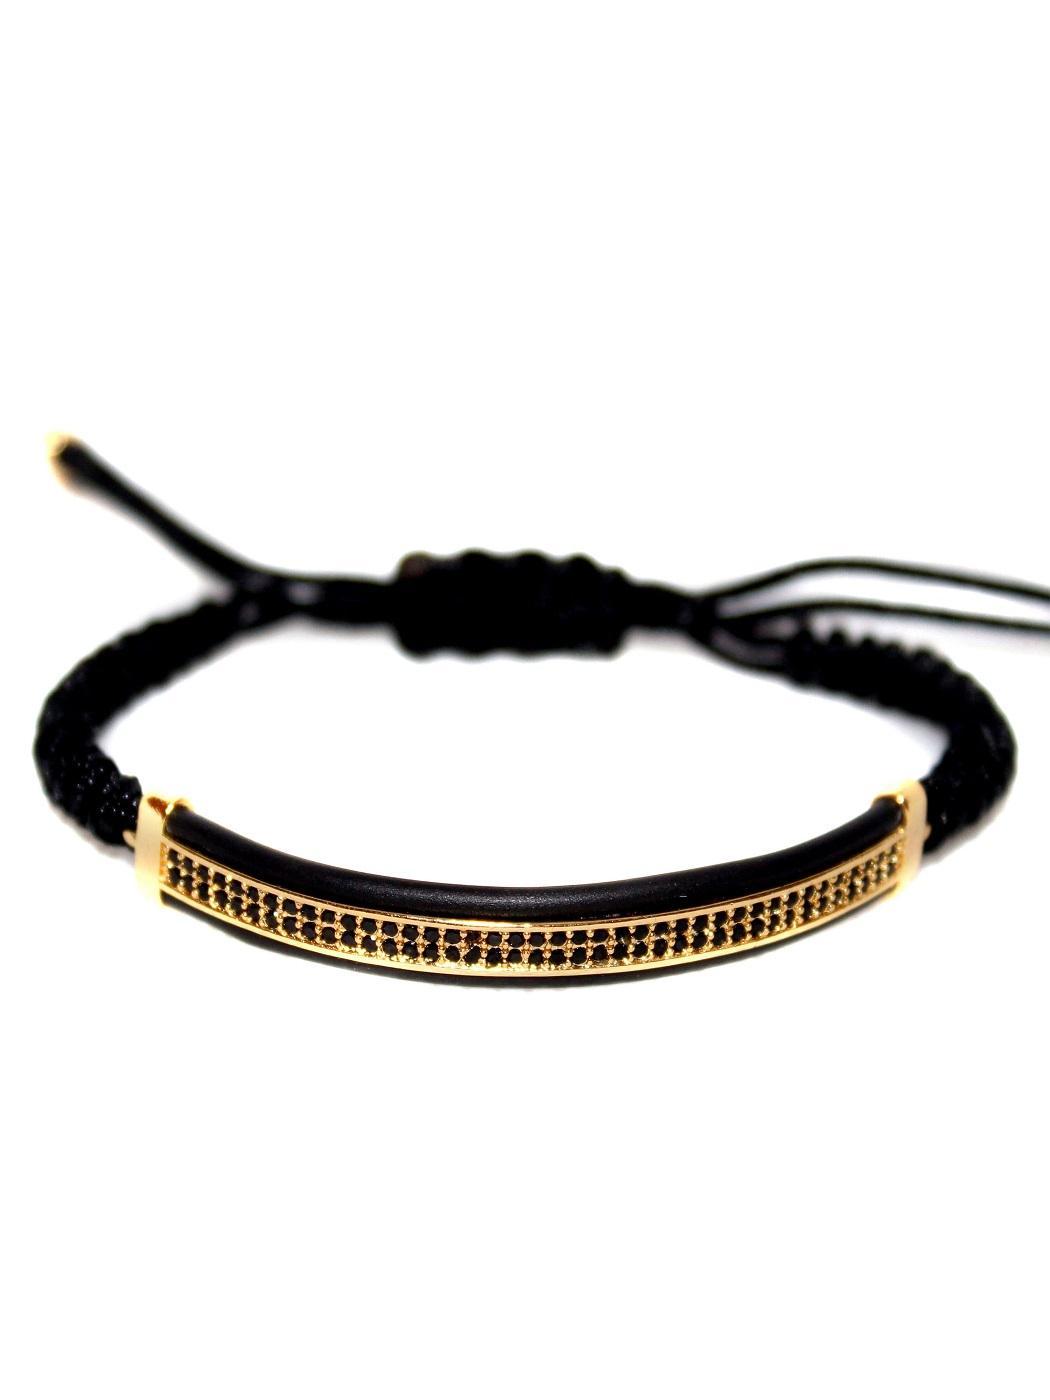 Love Bracelet Men, Zircon Bracelet, Wrist Chain Mens, Metal Cuffs, Popular Mens Bracelet, Mens Stacked Bracelets, Amazon Bangles, Beads And Bangles, Famous Bracelets, Cubic Zirconia Bracelet Mens New York